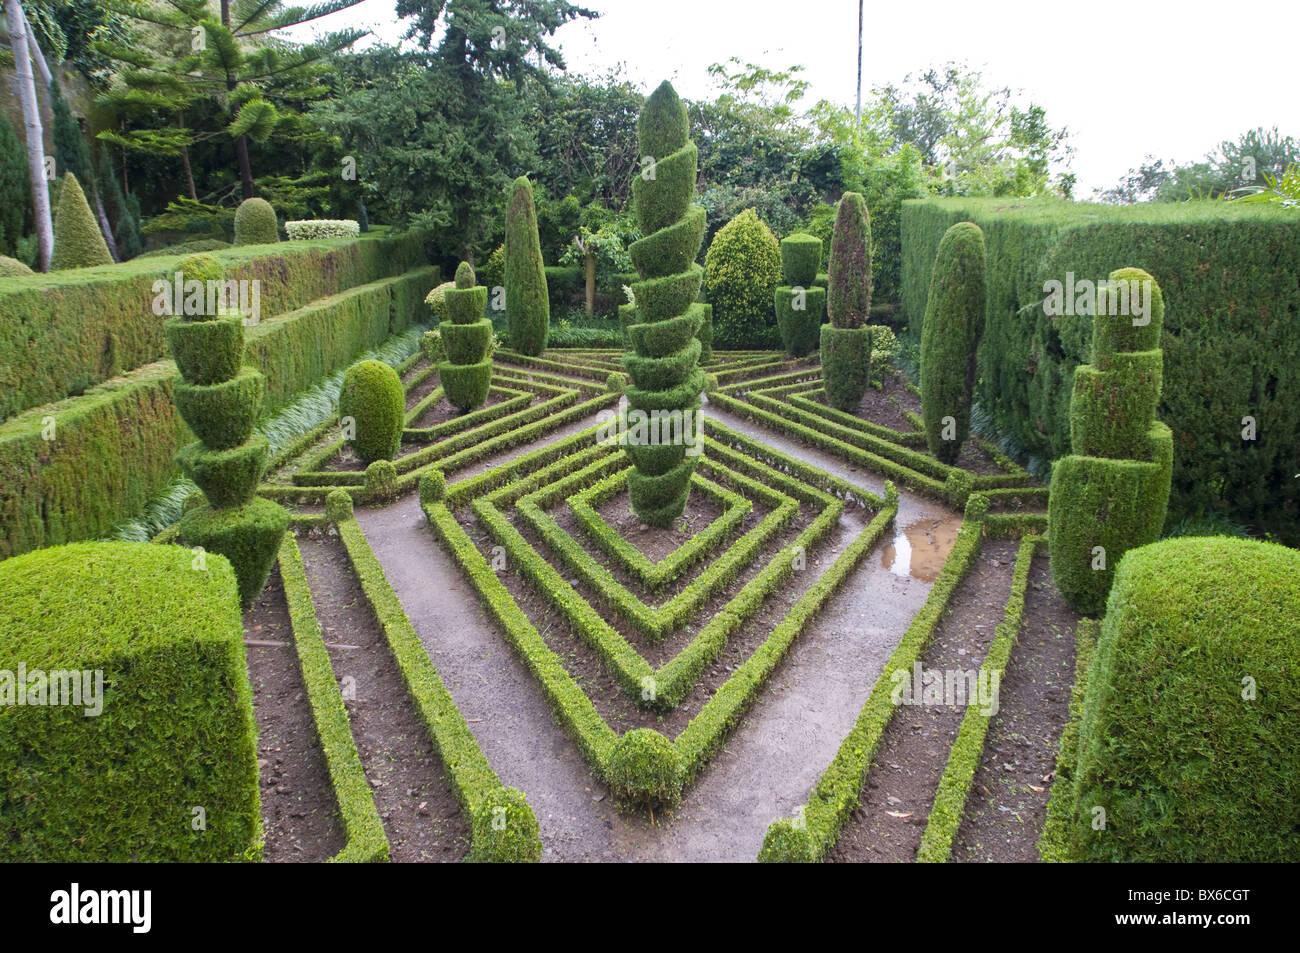 En topiaire jardin formel, le Jardin Botanique, Funchal, Madeira, Portugal, Europe Photo Stock